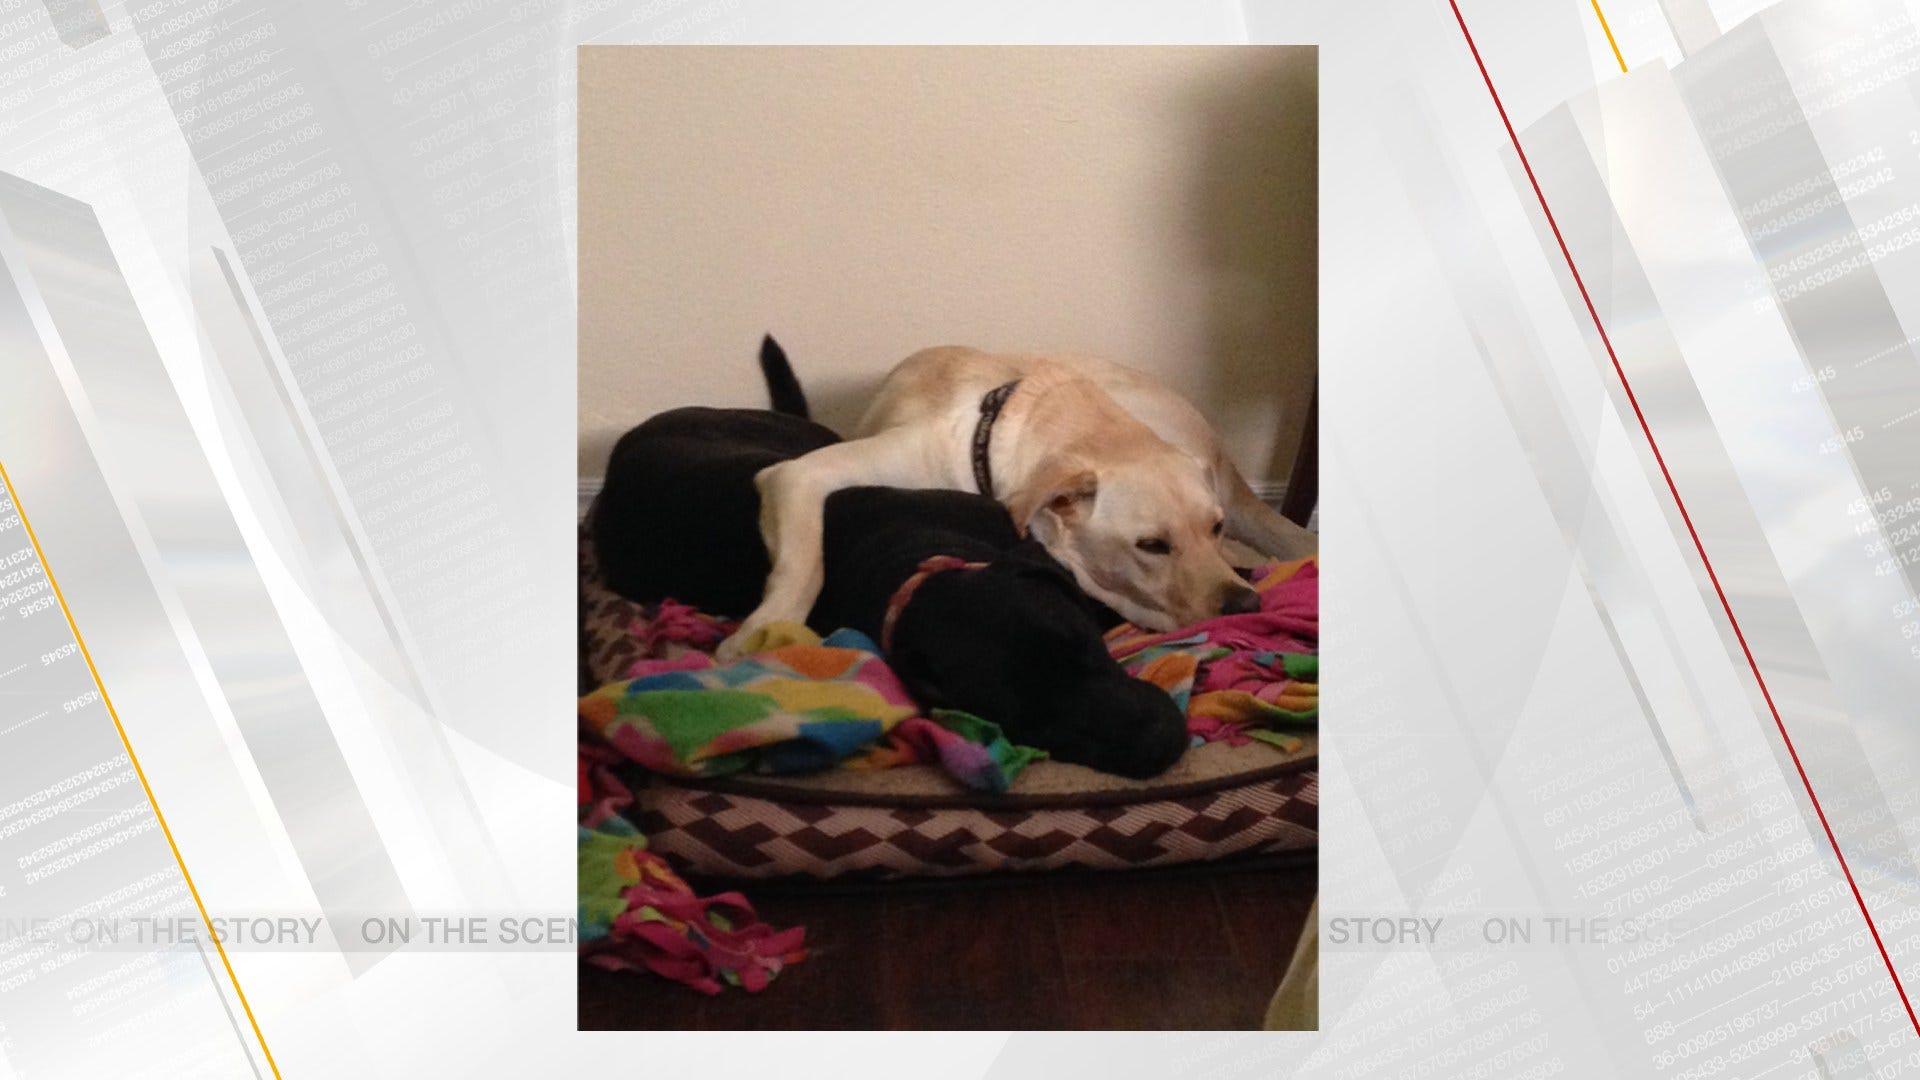 OKC Animal Welfare Offers Free Dog And Cat Adoptions Saturday